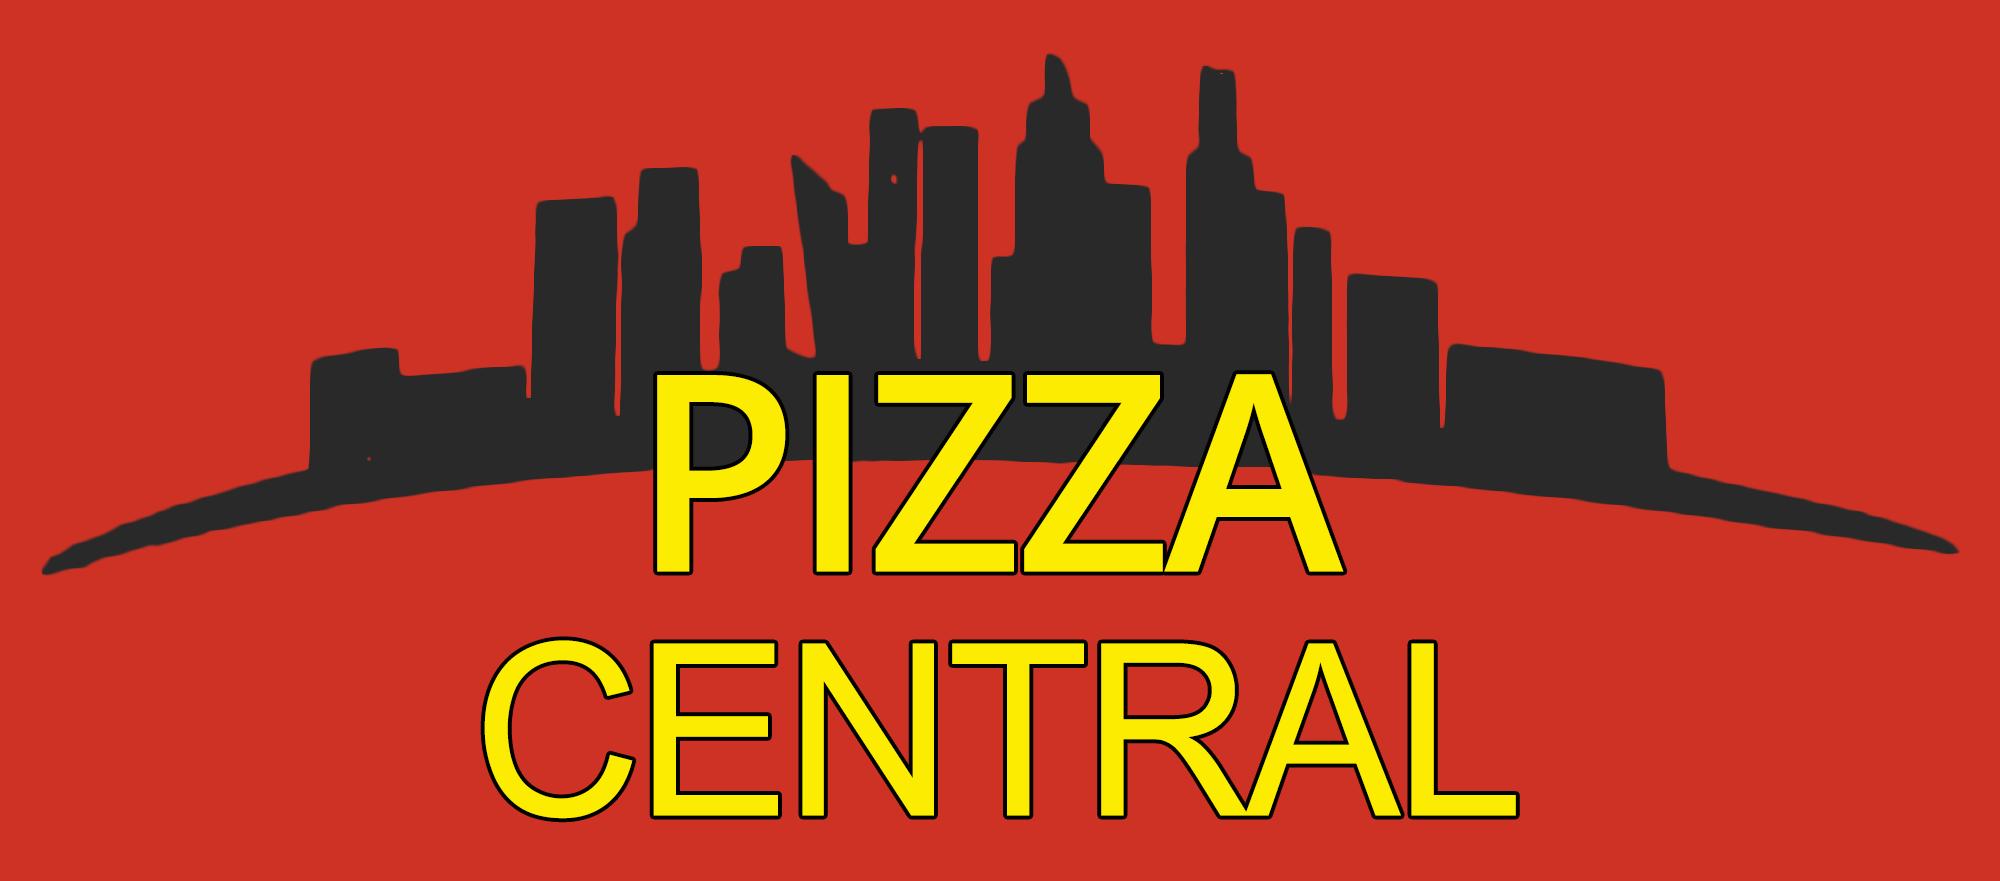 Pizza Central Order Online Pizza Central Menu Menu For